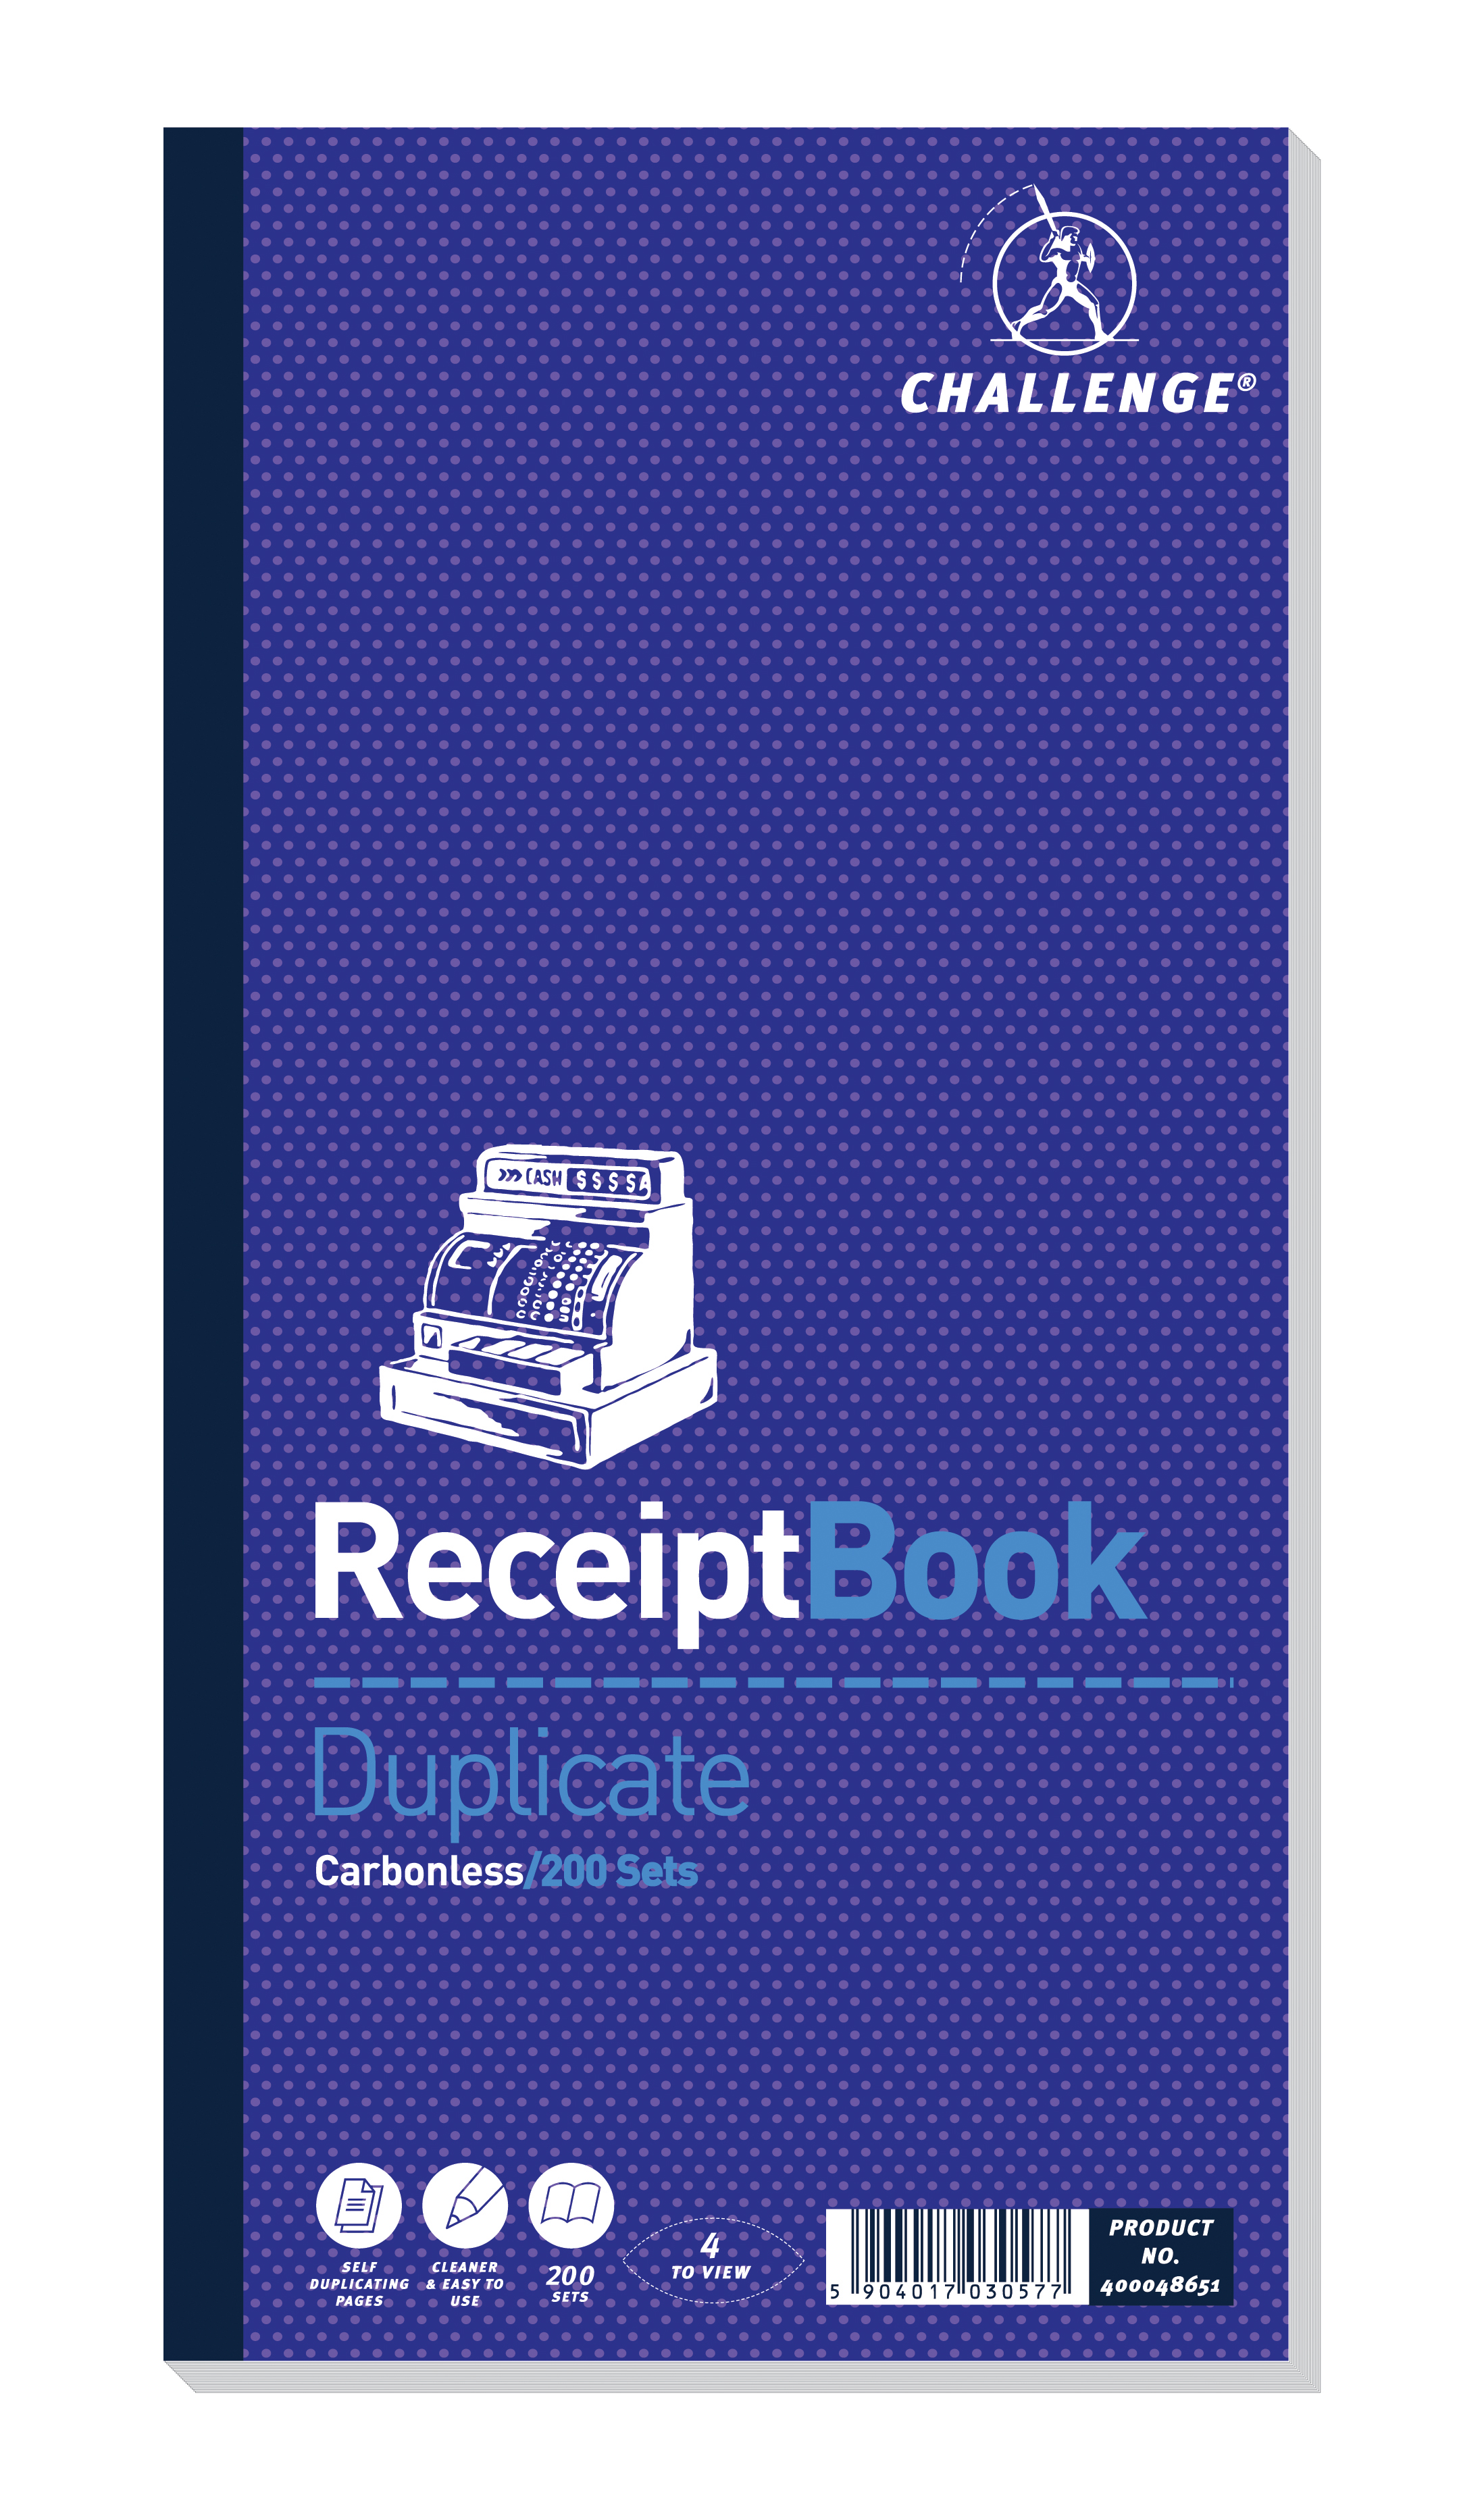 Challenge Duplicate Book Carbonless Receipt 4 Sets Per Page 200 280x141mm Ref 400048651